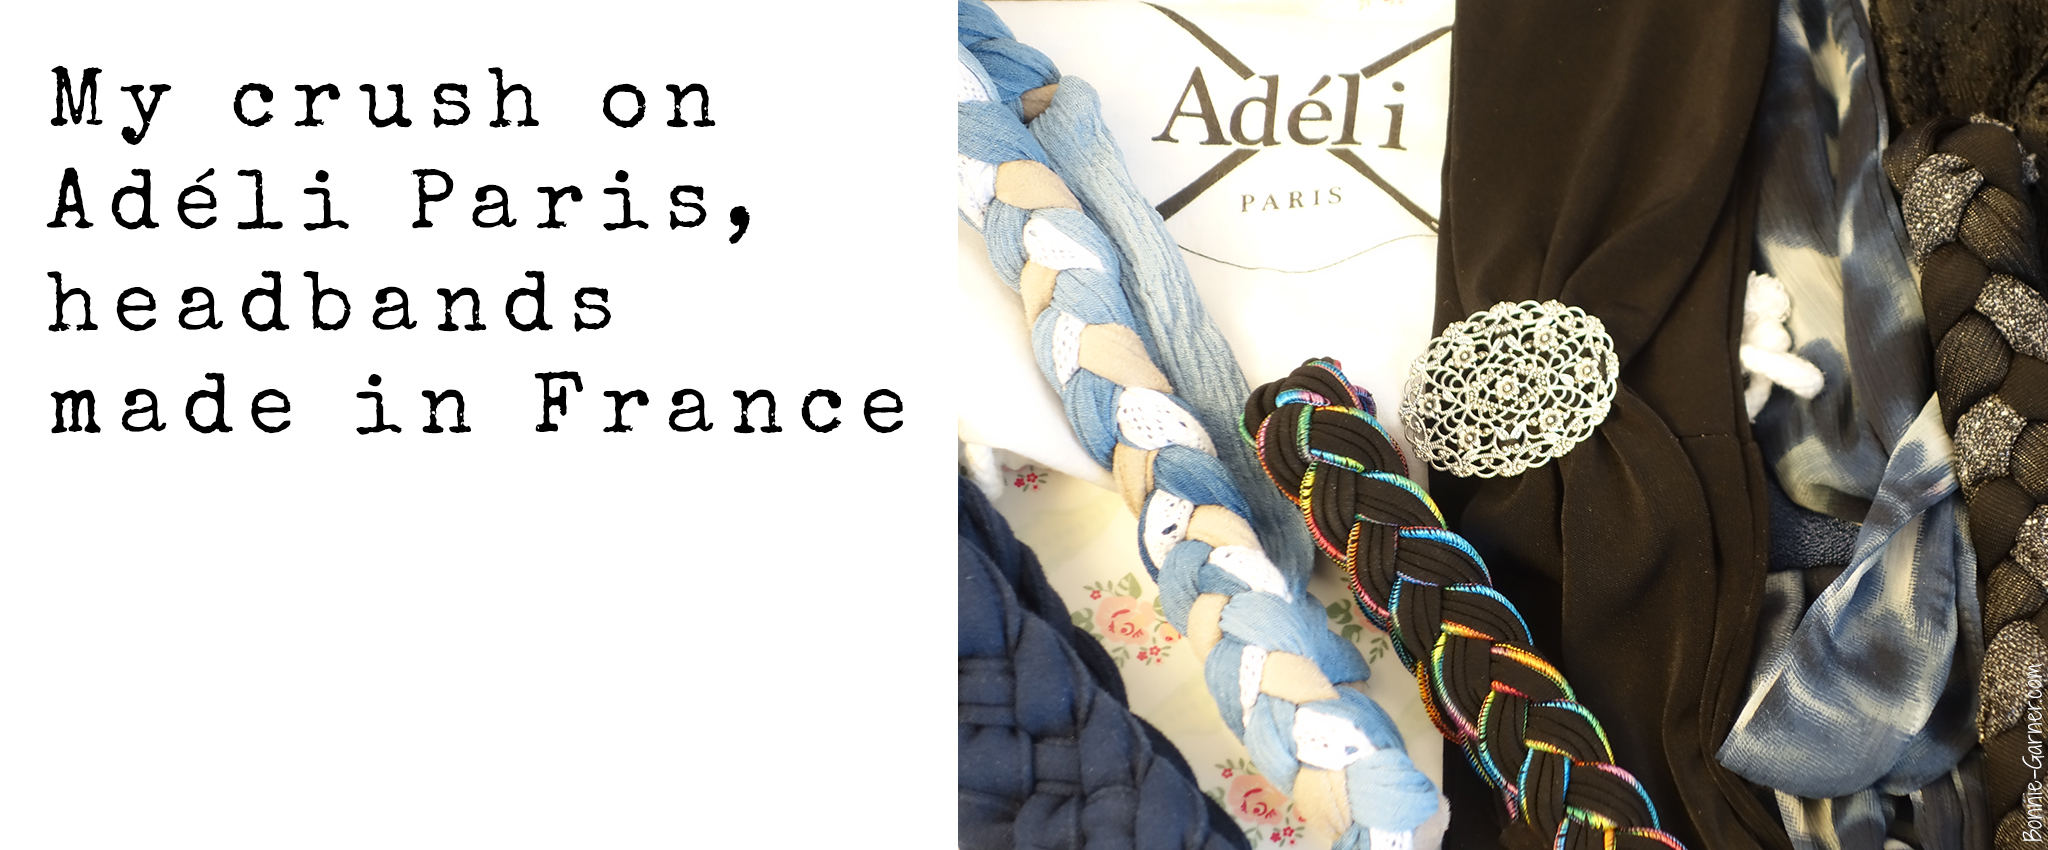 My crush on Adéli Paris, headbands made in France